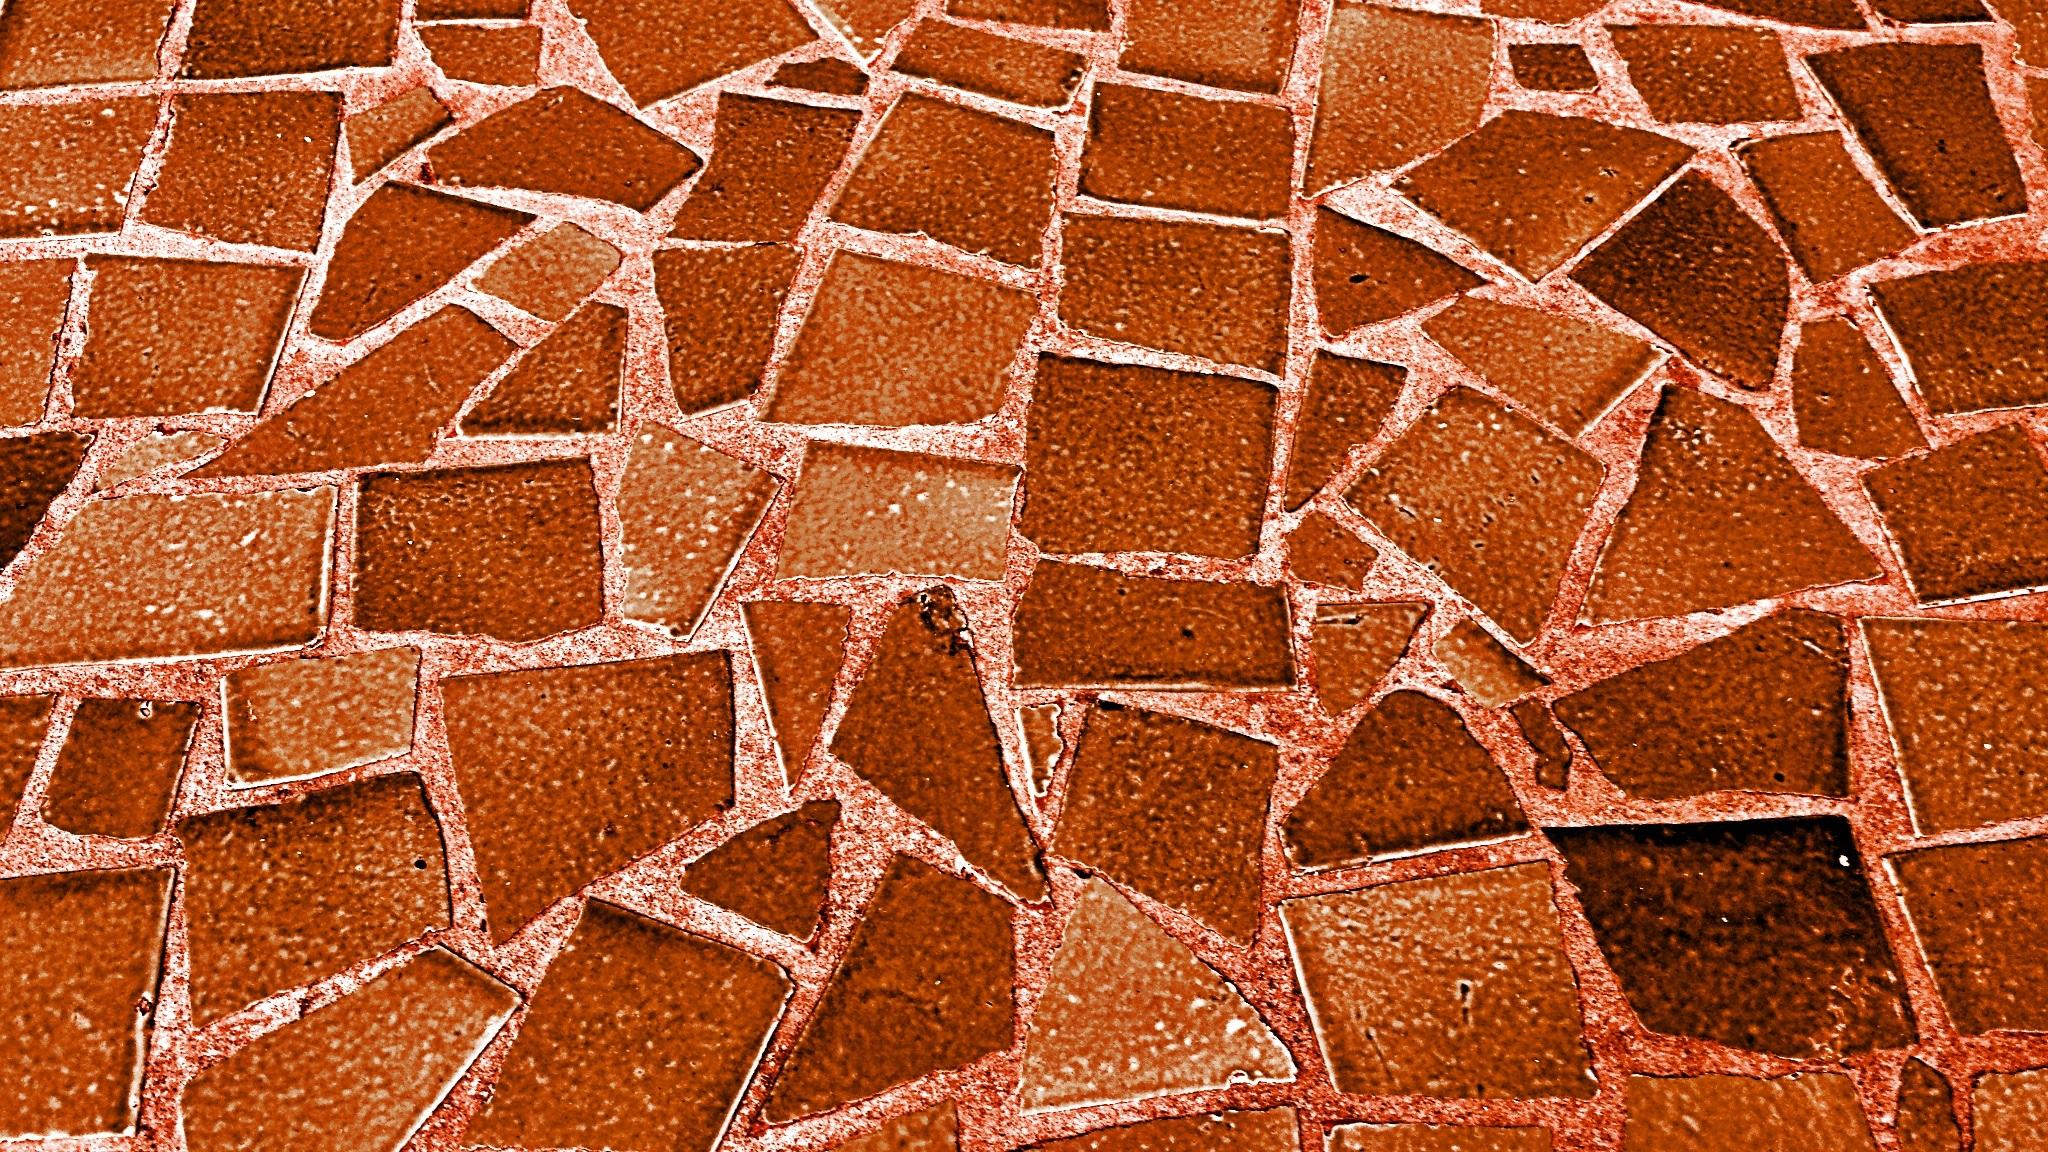 Modern mor renkli banyo dekorasyonu ev dekorasyonu dizayn - Foto Raf Doku Zemin I Ev Duvar Dekorasyon In Aat Desen Seramik Kapal Toprak Fayans Tu La Dekor Modern Malzeme Y Zey Banyo D Emek